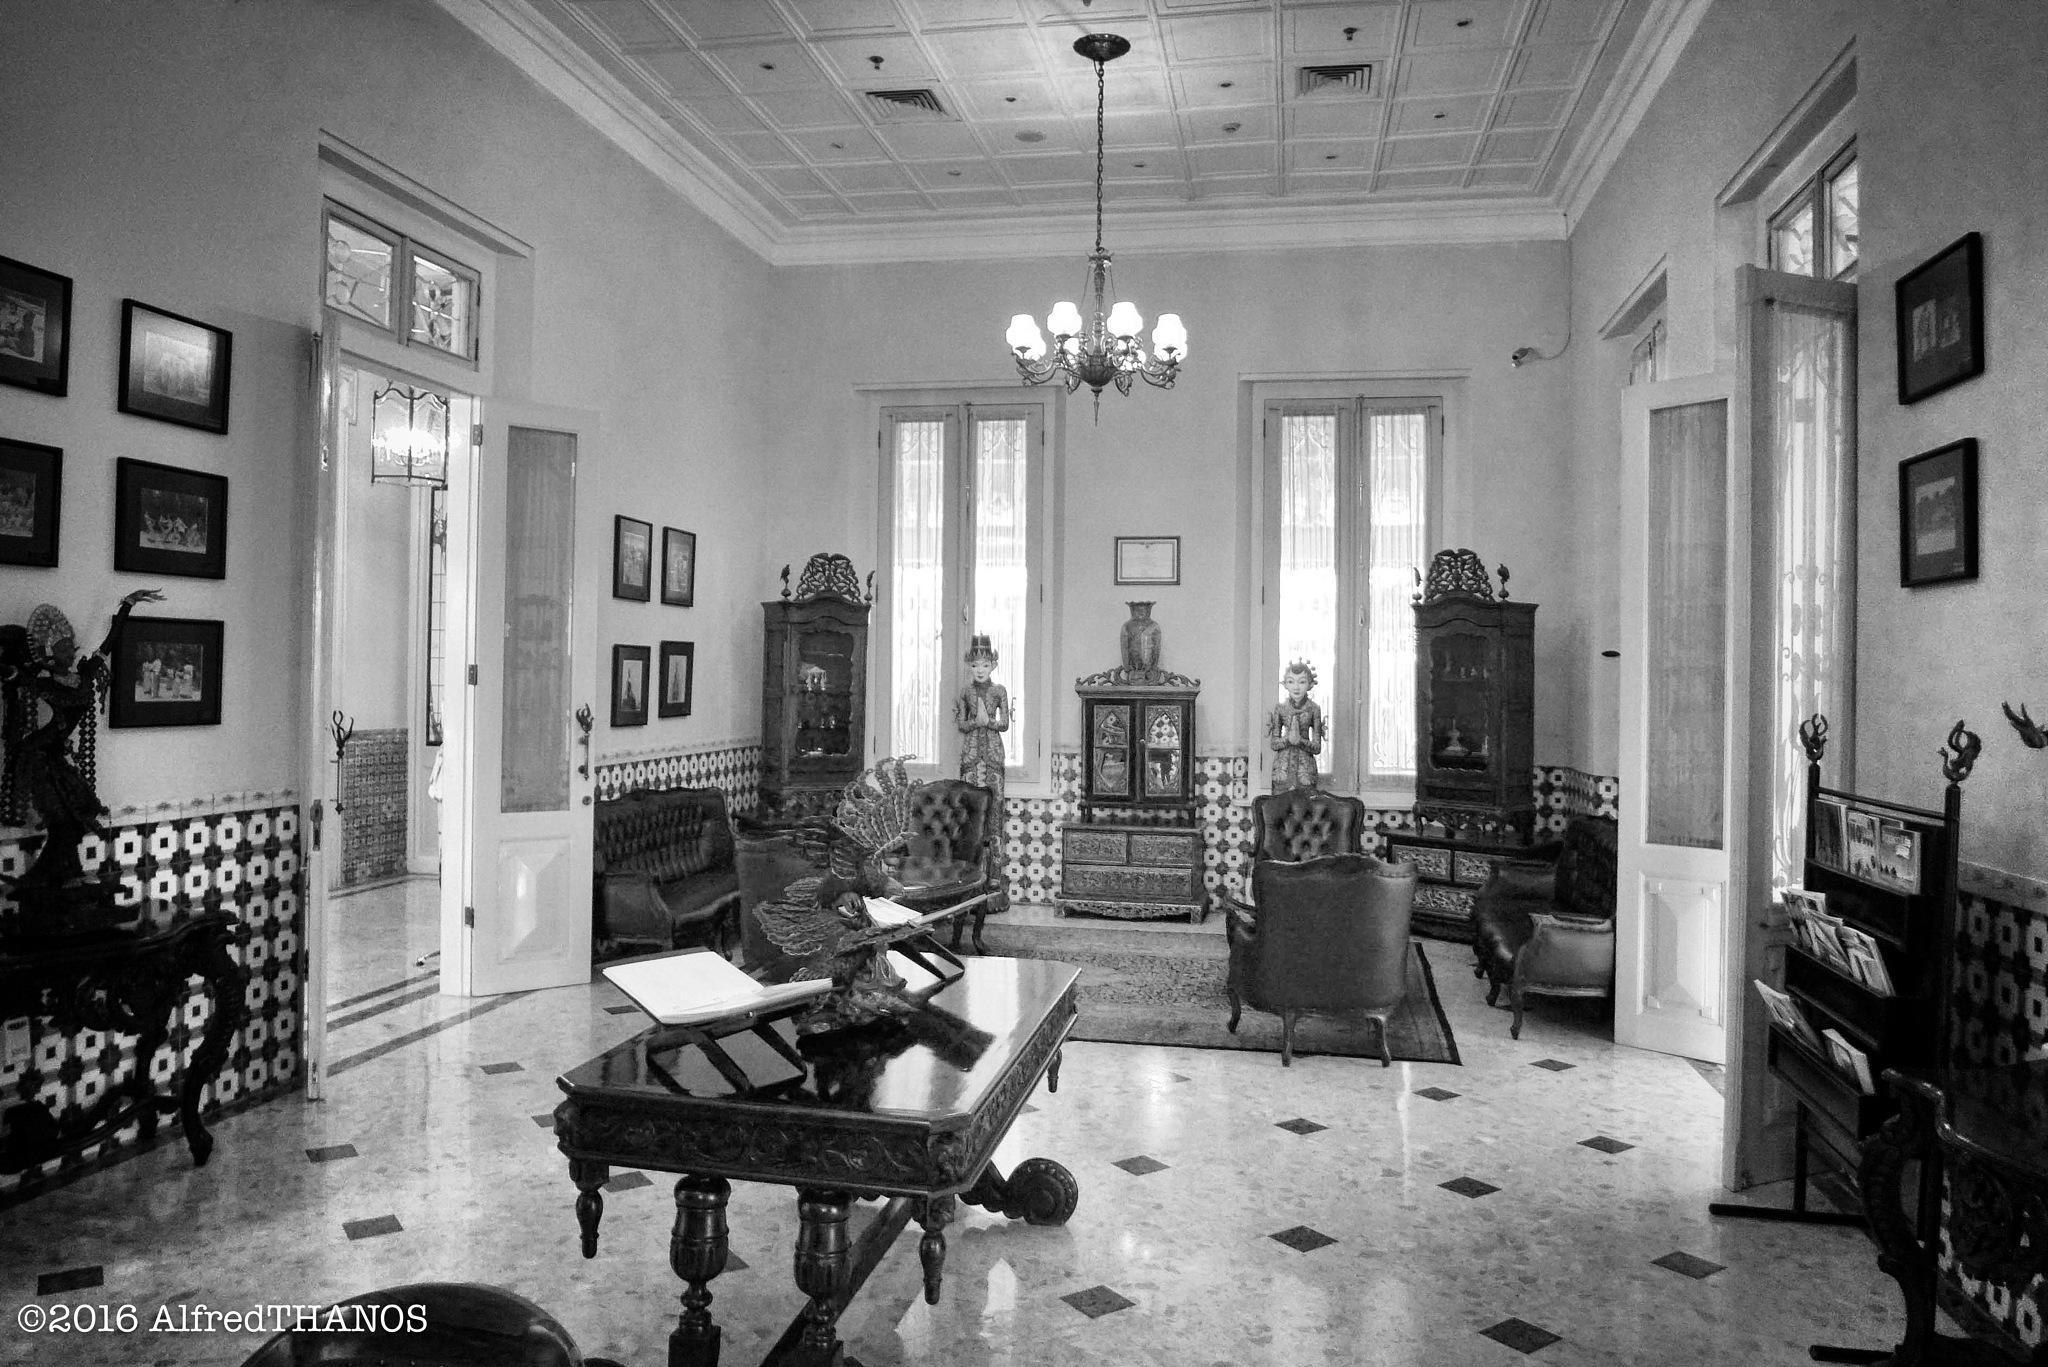 Lobby Area by alfredthanos